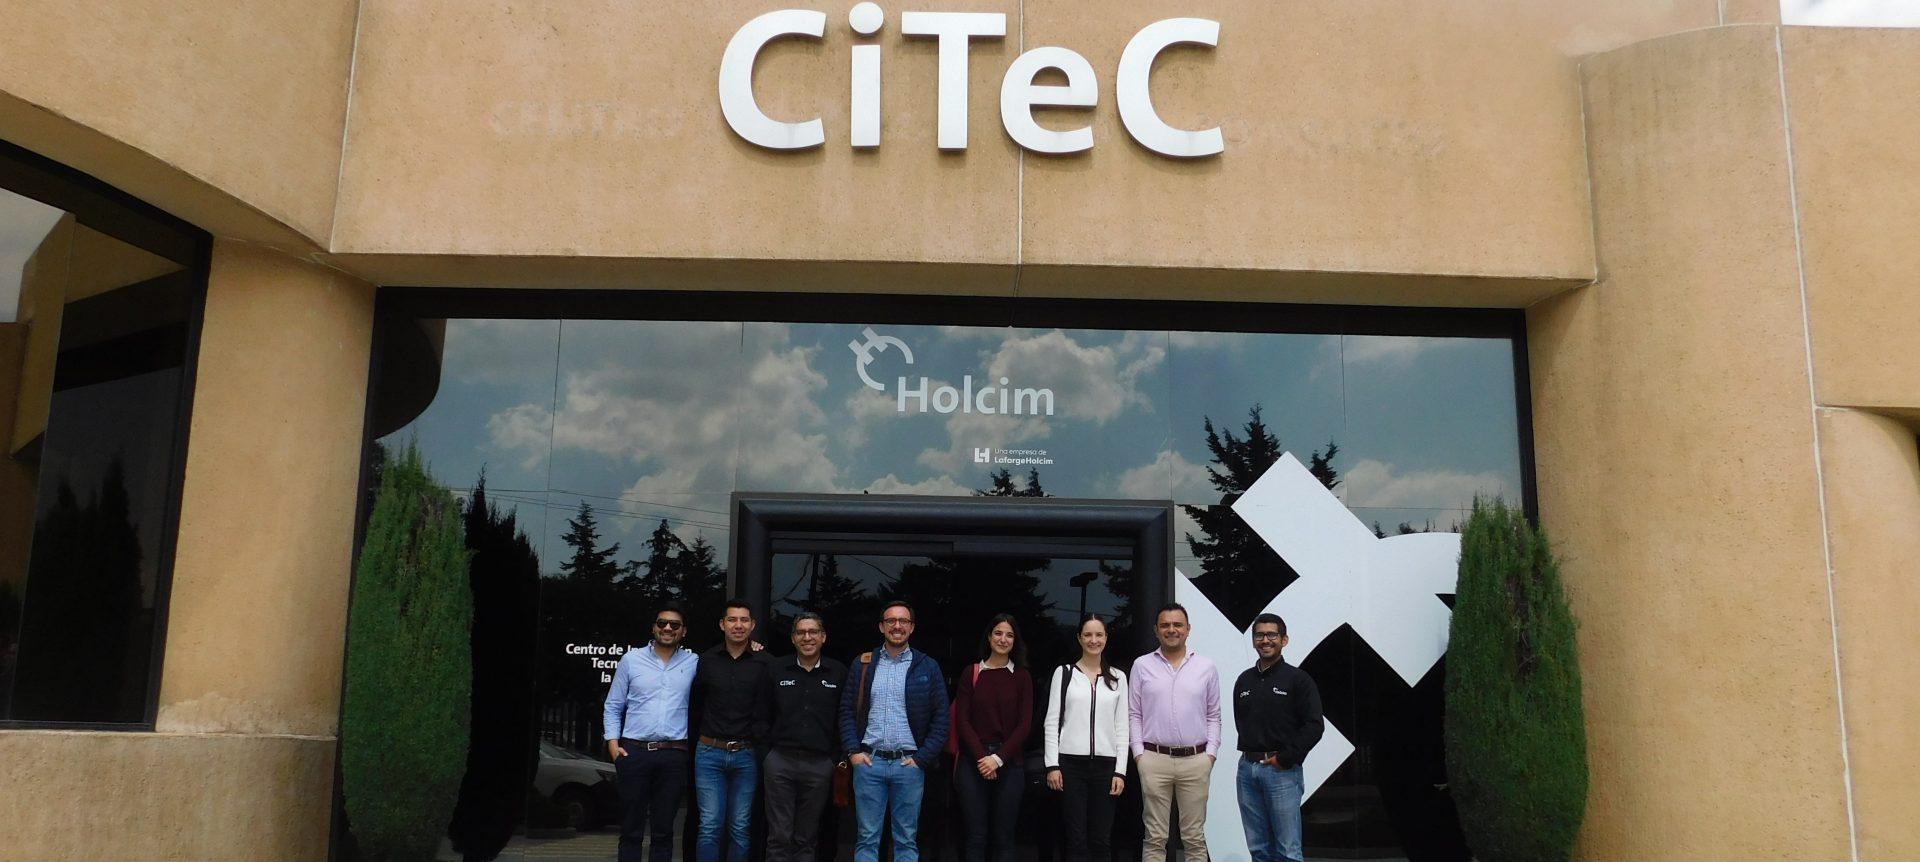 Visita al CiTec de Holcim México